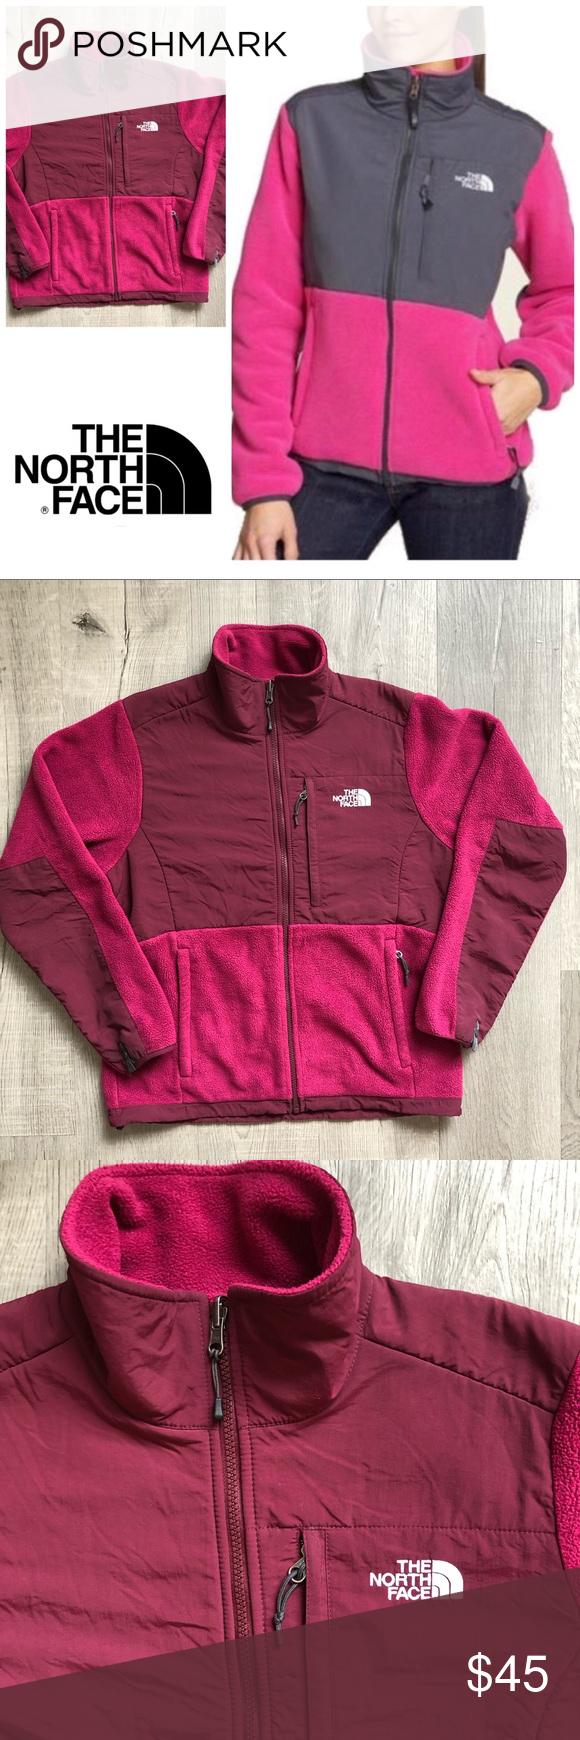 The North Face Jacket Denali Raspberry Fleece Zip North Face Jacket Clothes Design Fashion [ 1740 x 580 Pixel ]